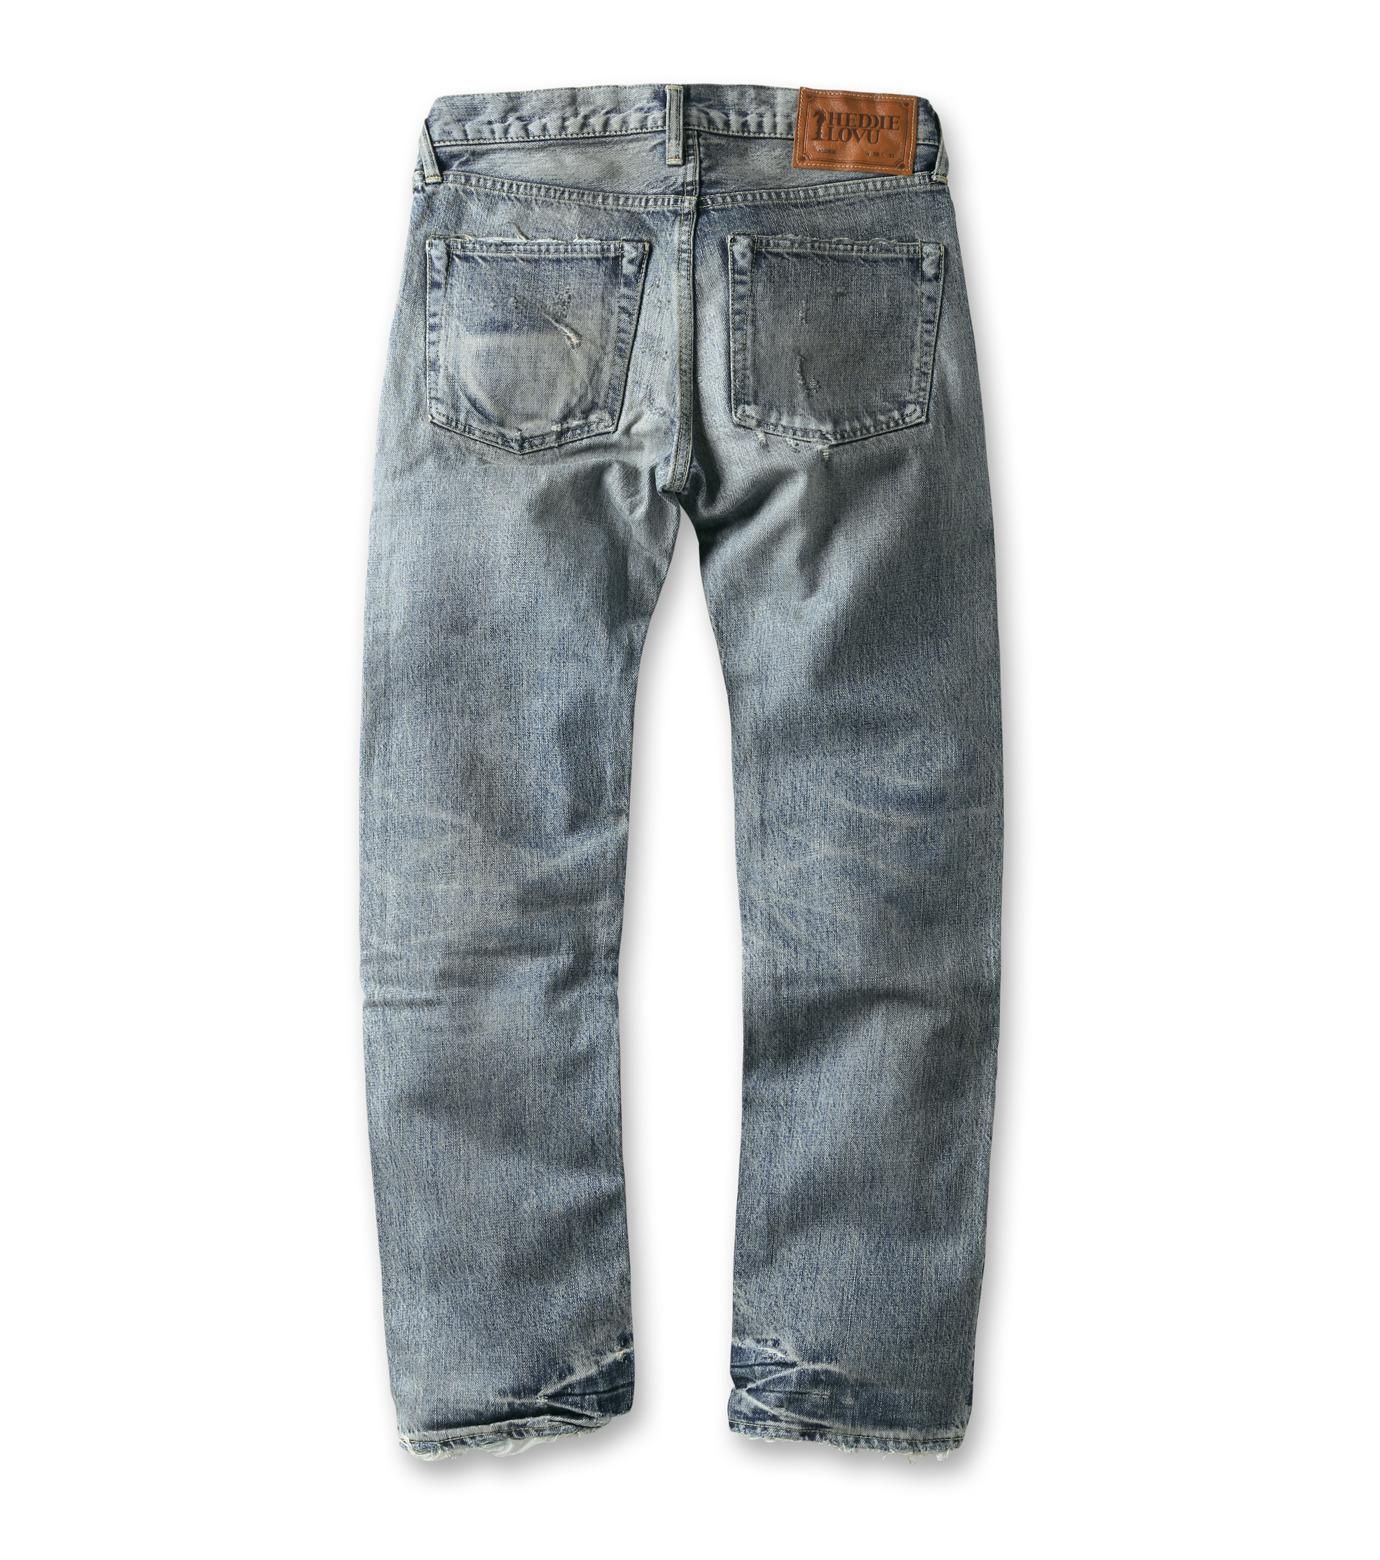 Heddie Lovu(エディー ルーヴ)のALD-CTM-02-BLUE(パンツ/pants)-ALD-CTM-02-92 拡大詳細画像2